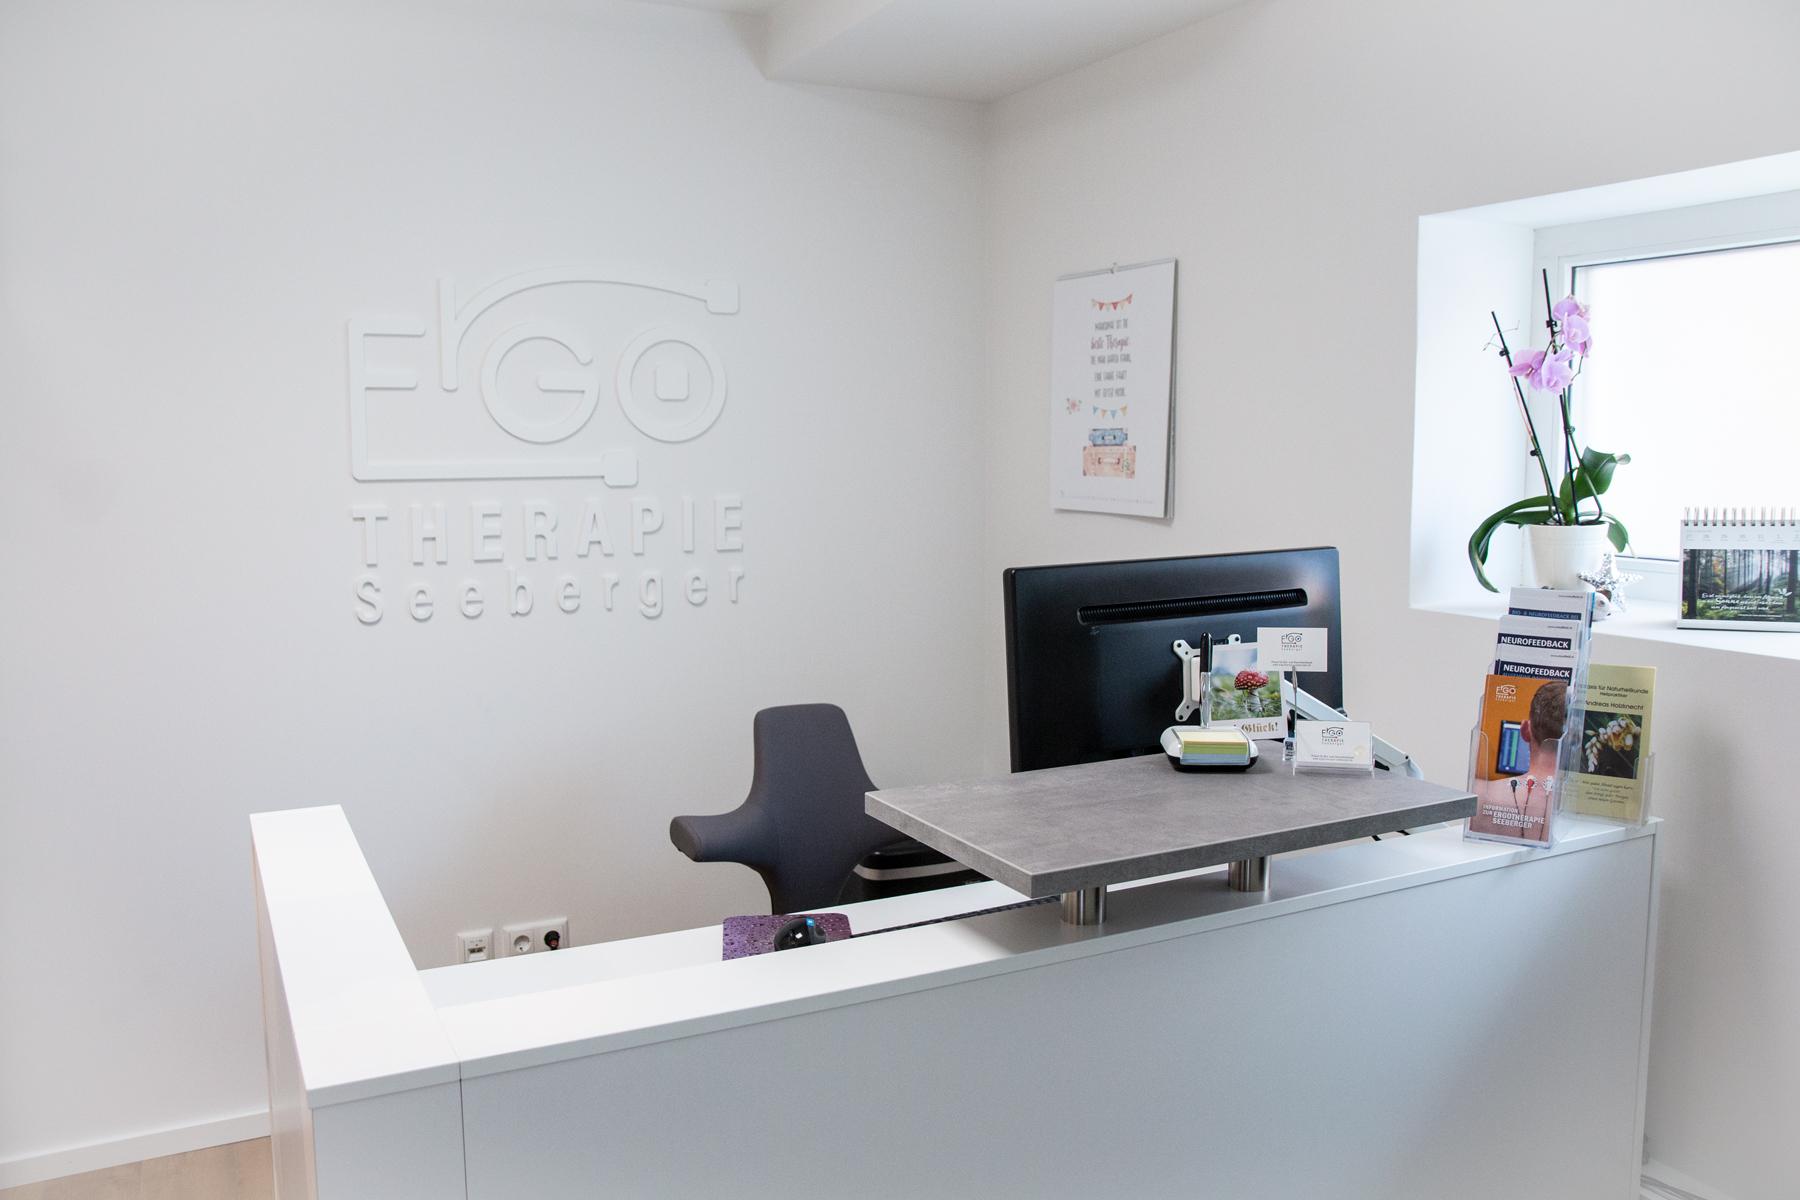 Ran Keren, Logodesign, Corporate Identity, Ergotherapie Seeberger, Praxis